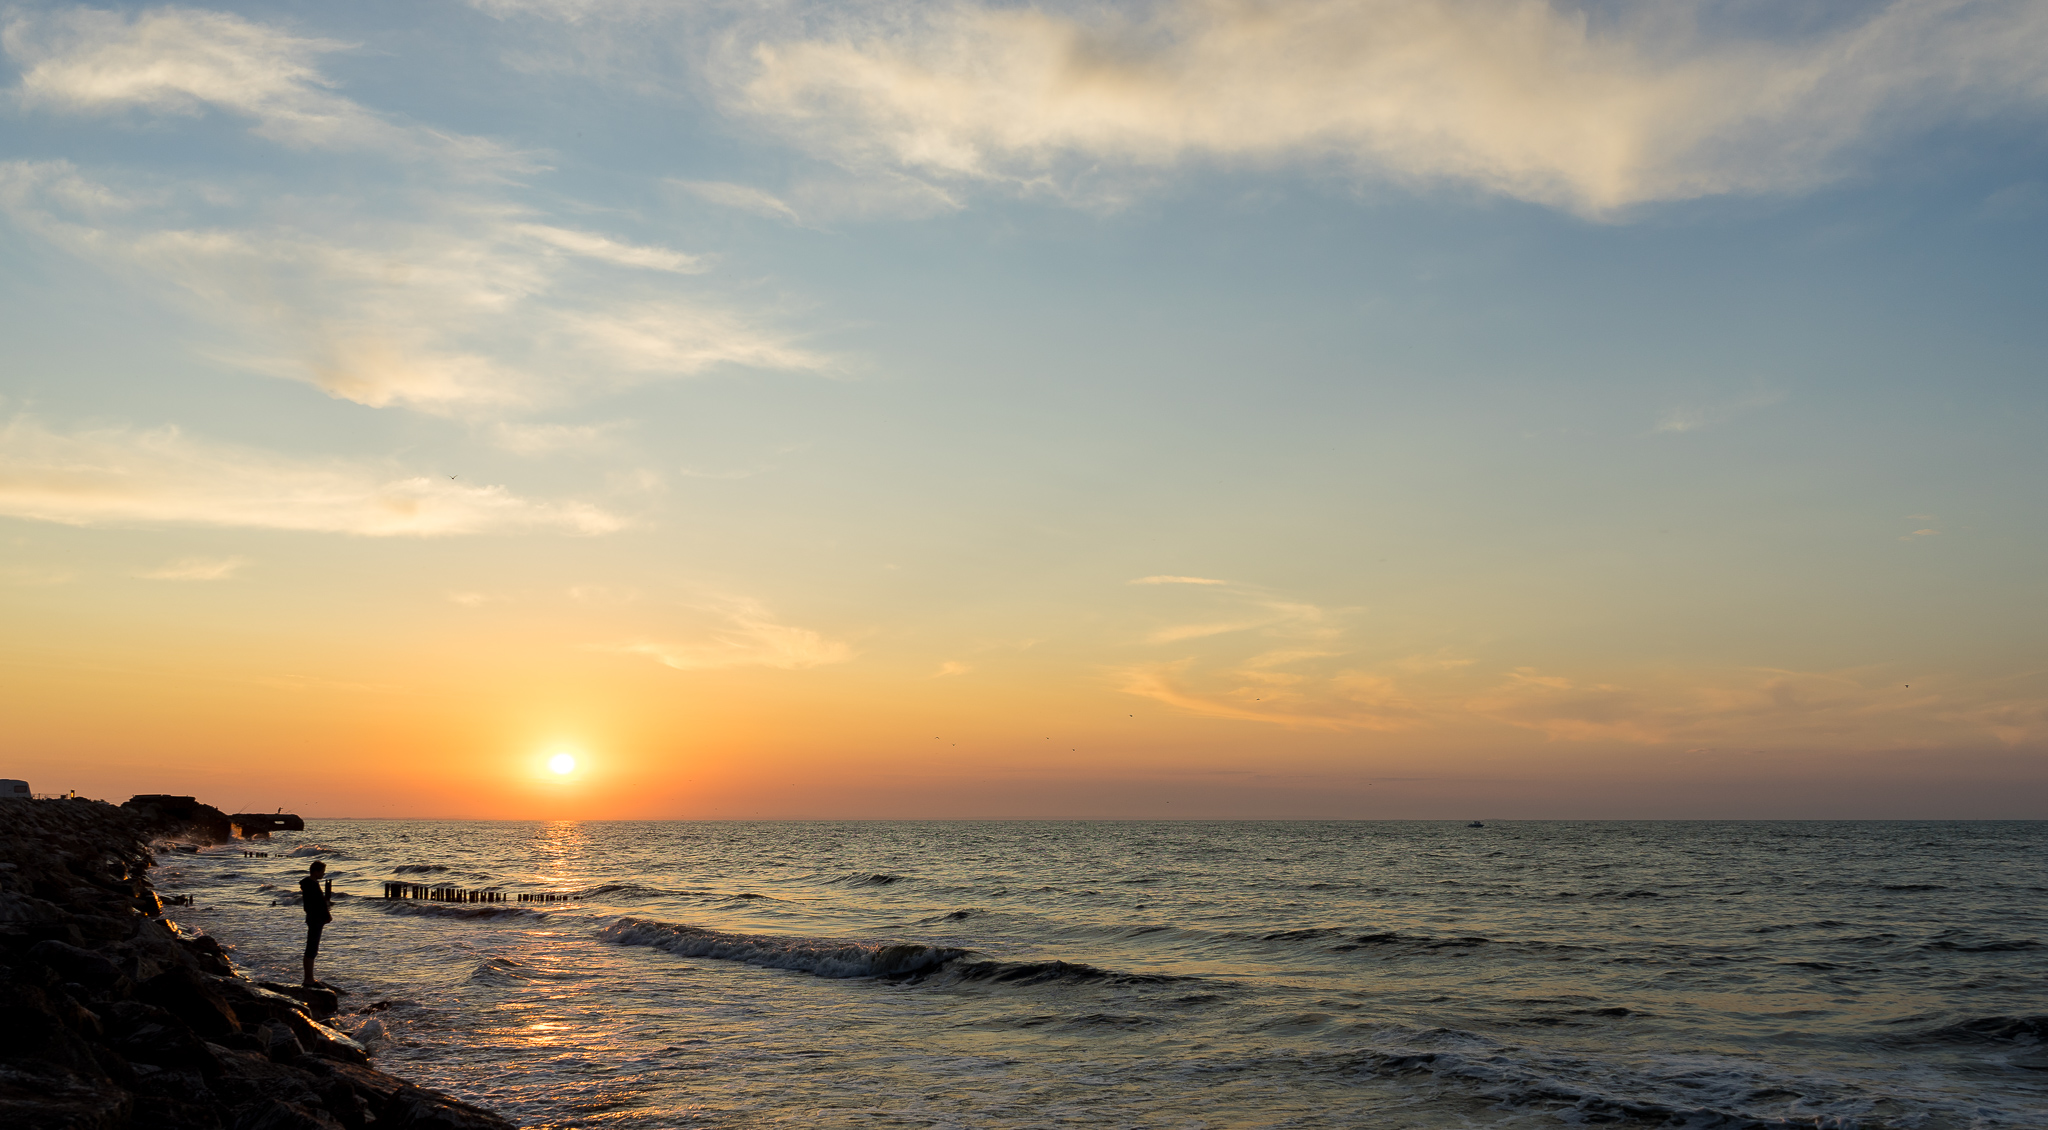 sunset crandcamp-maisy - 20140725